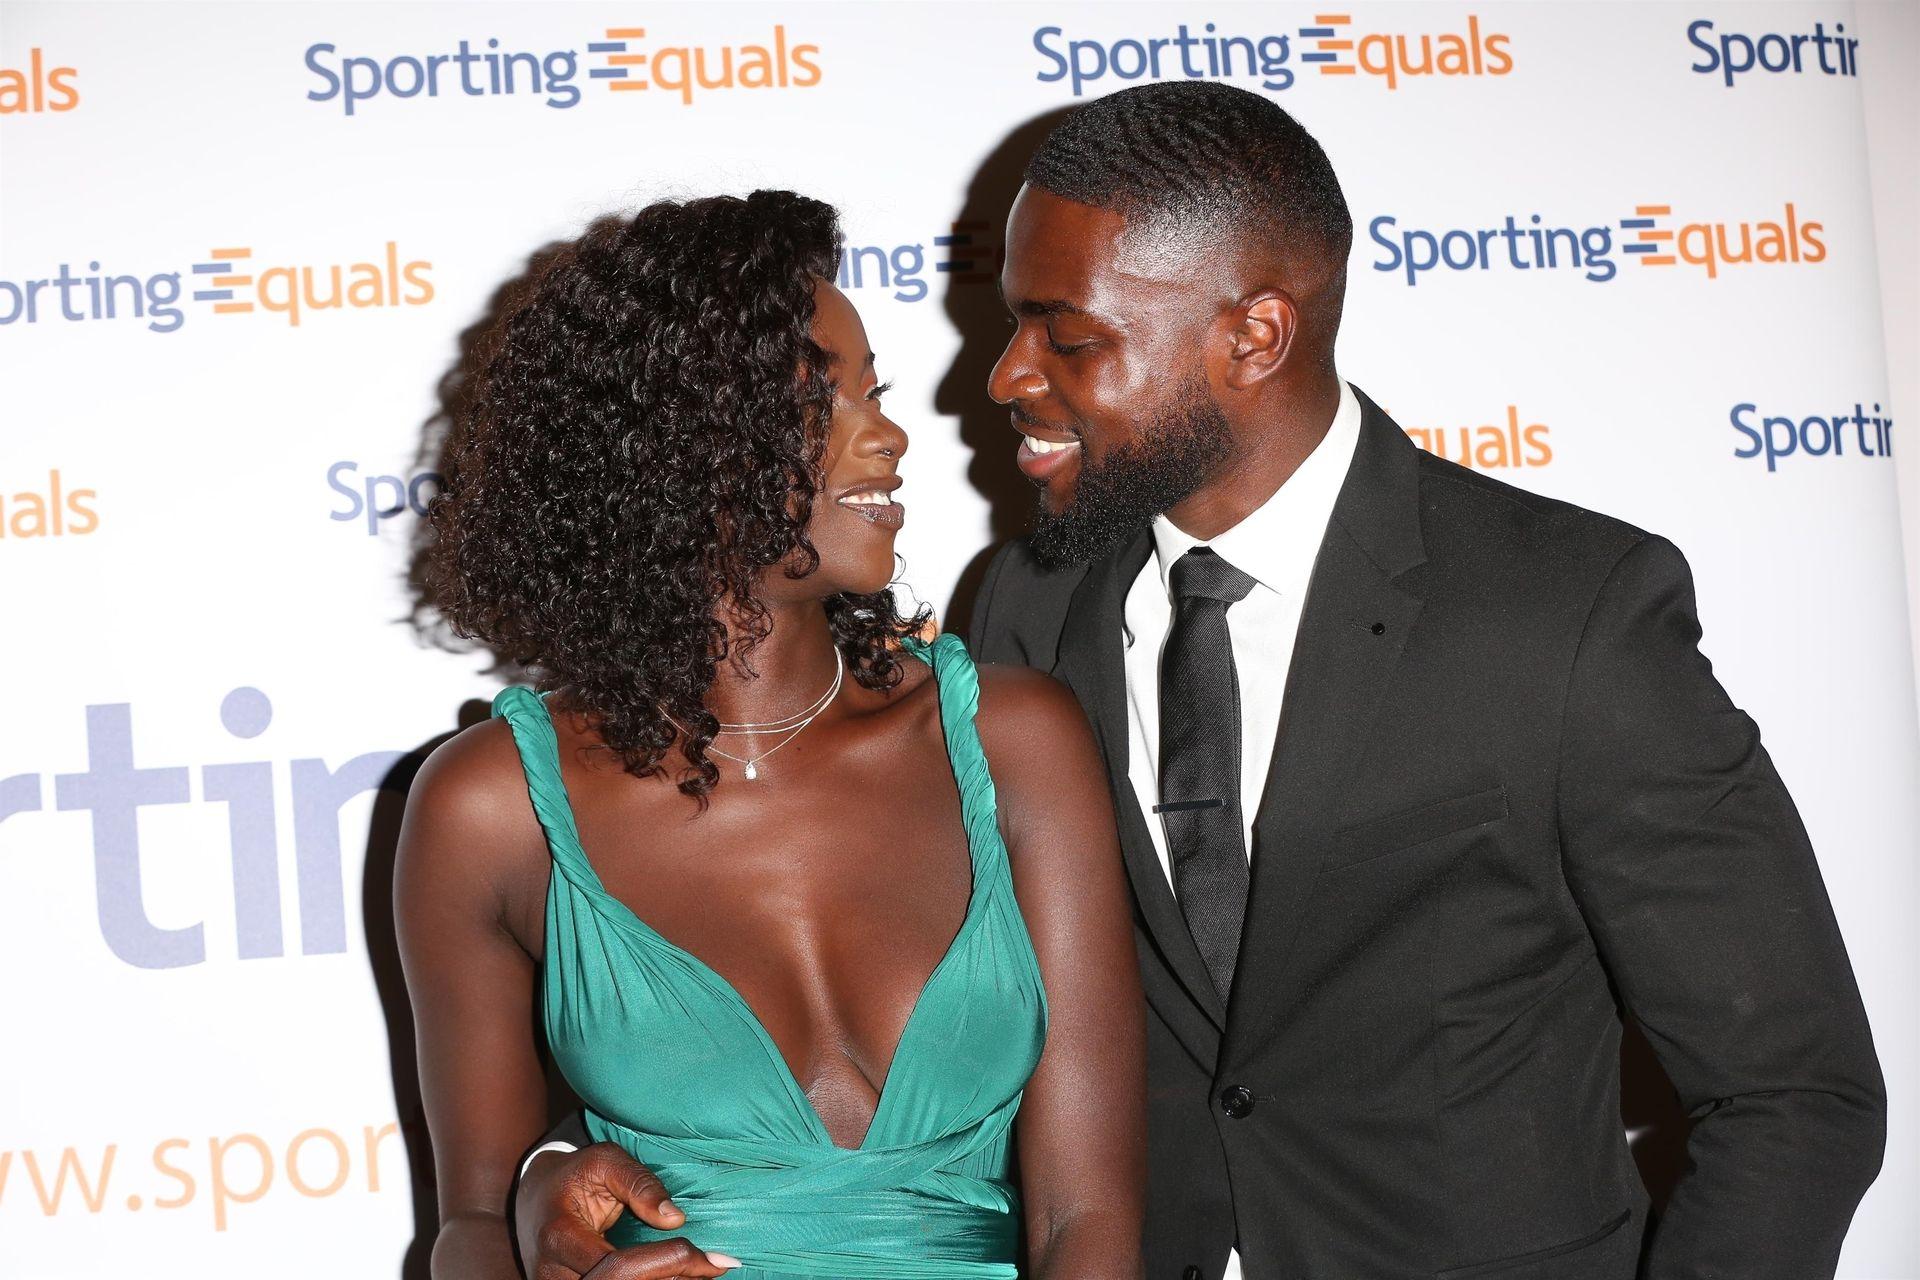 Mike Boateng & Priscilla Anyabu Are Seen At British Ethnic Diversity Sports Awards 0108